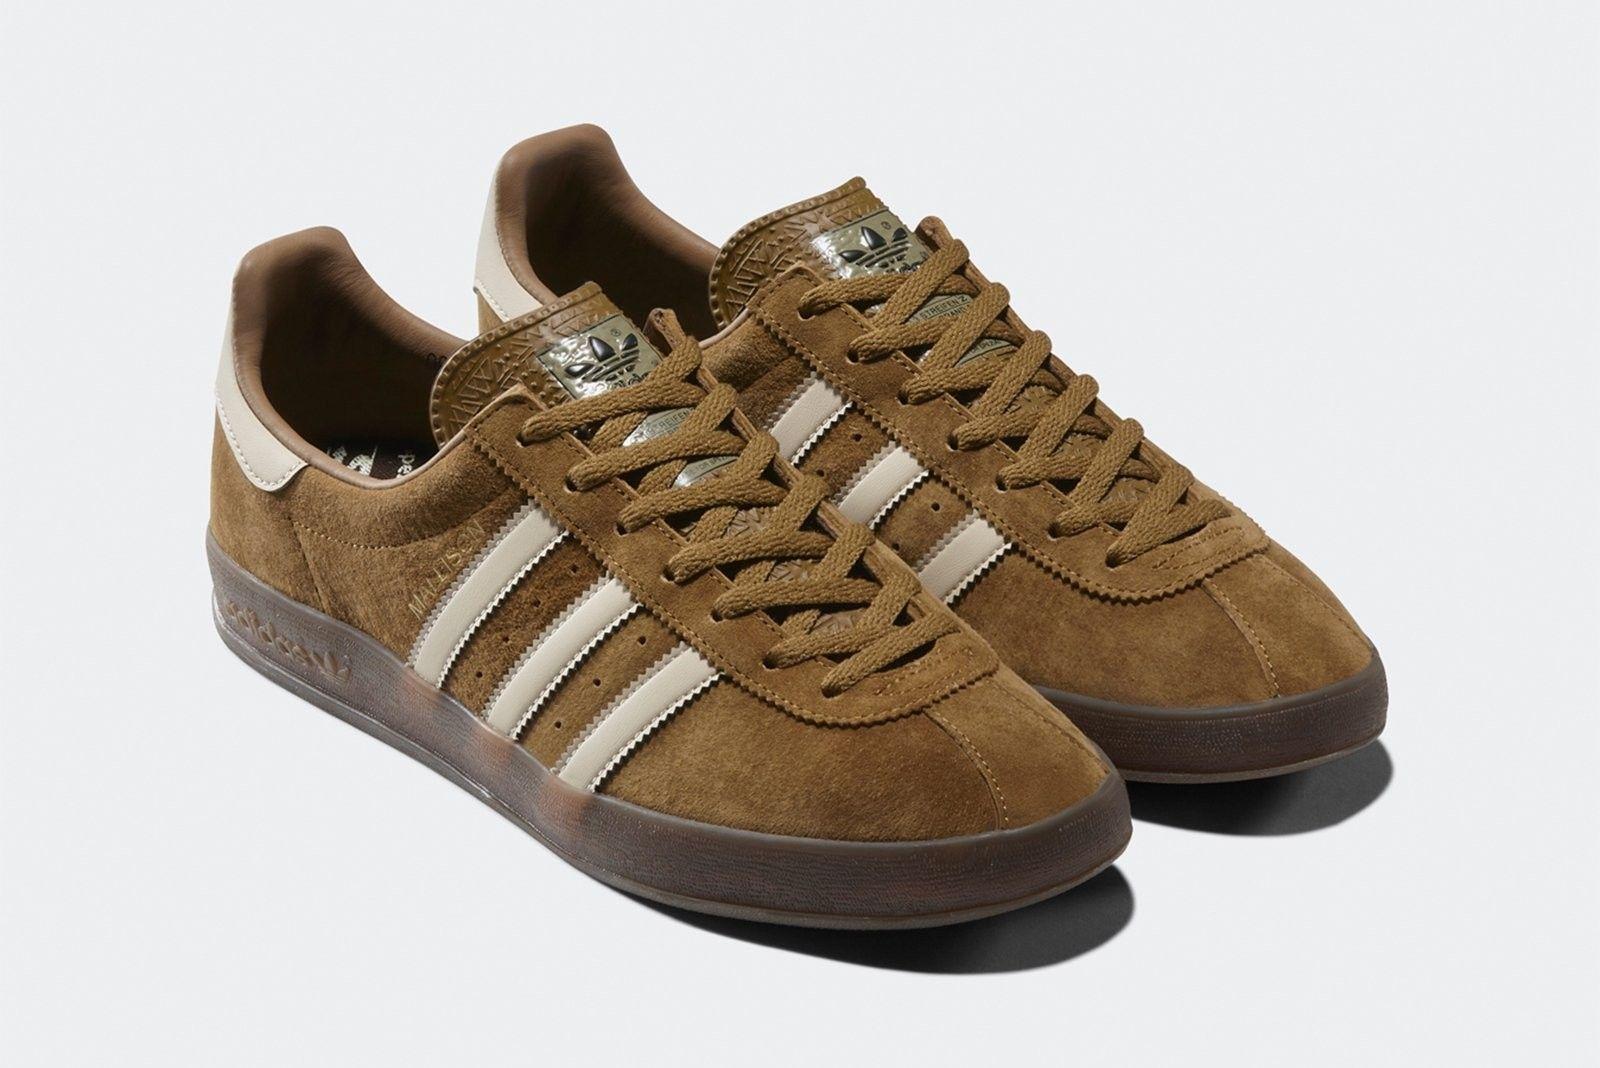 huge sale 946d8 fef8c Adidas Mallison Spezial launches 21st September - Adidas Spezial AW18 range